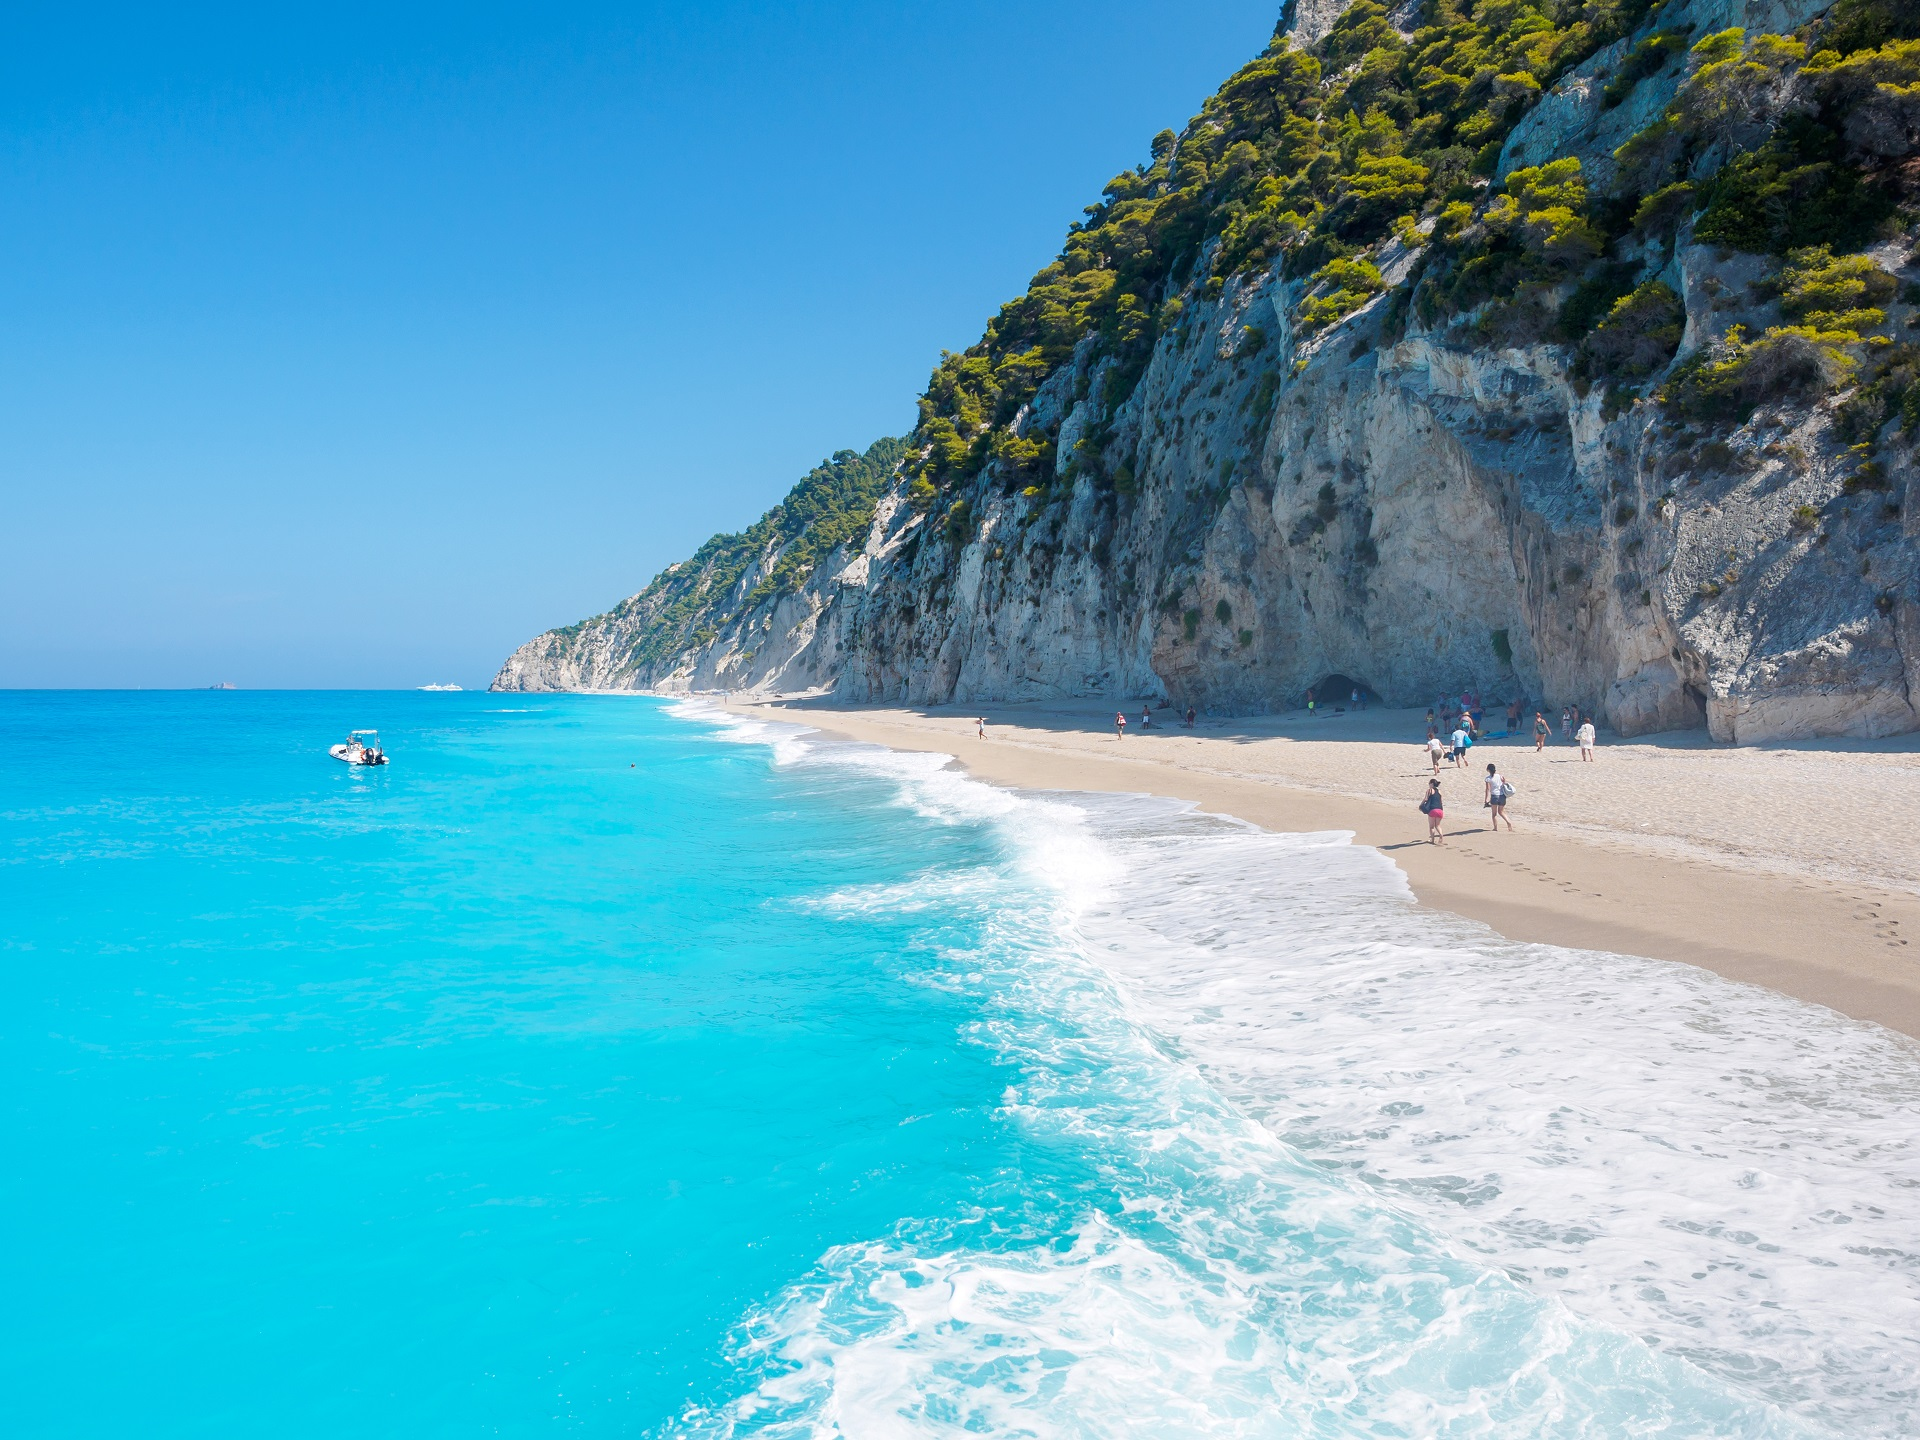 Egremnoi beach, Lefkada